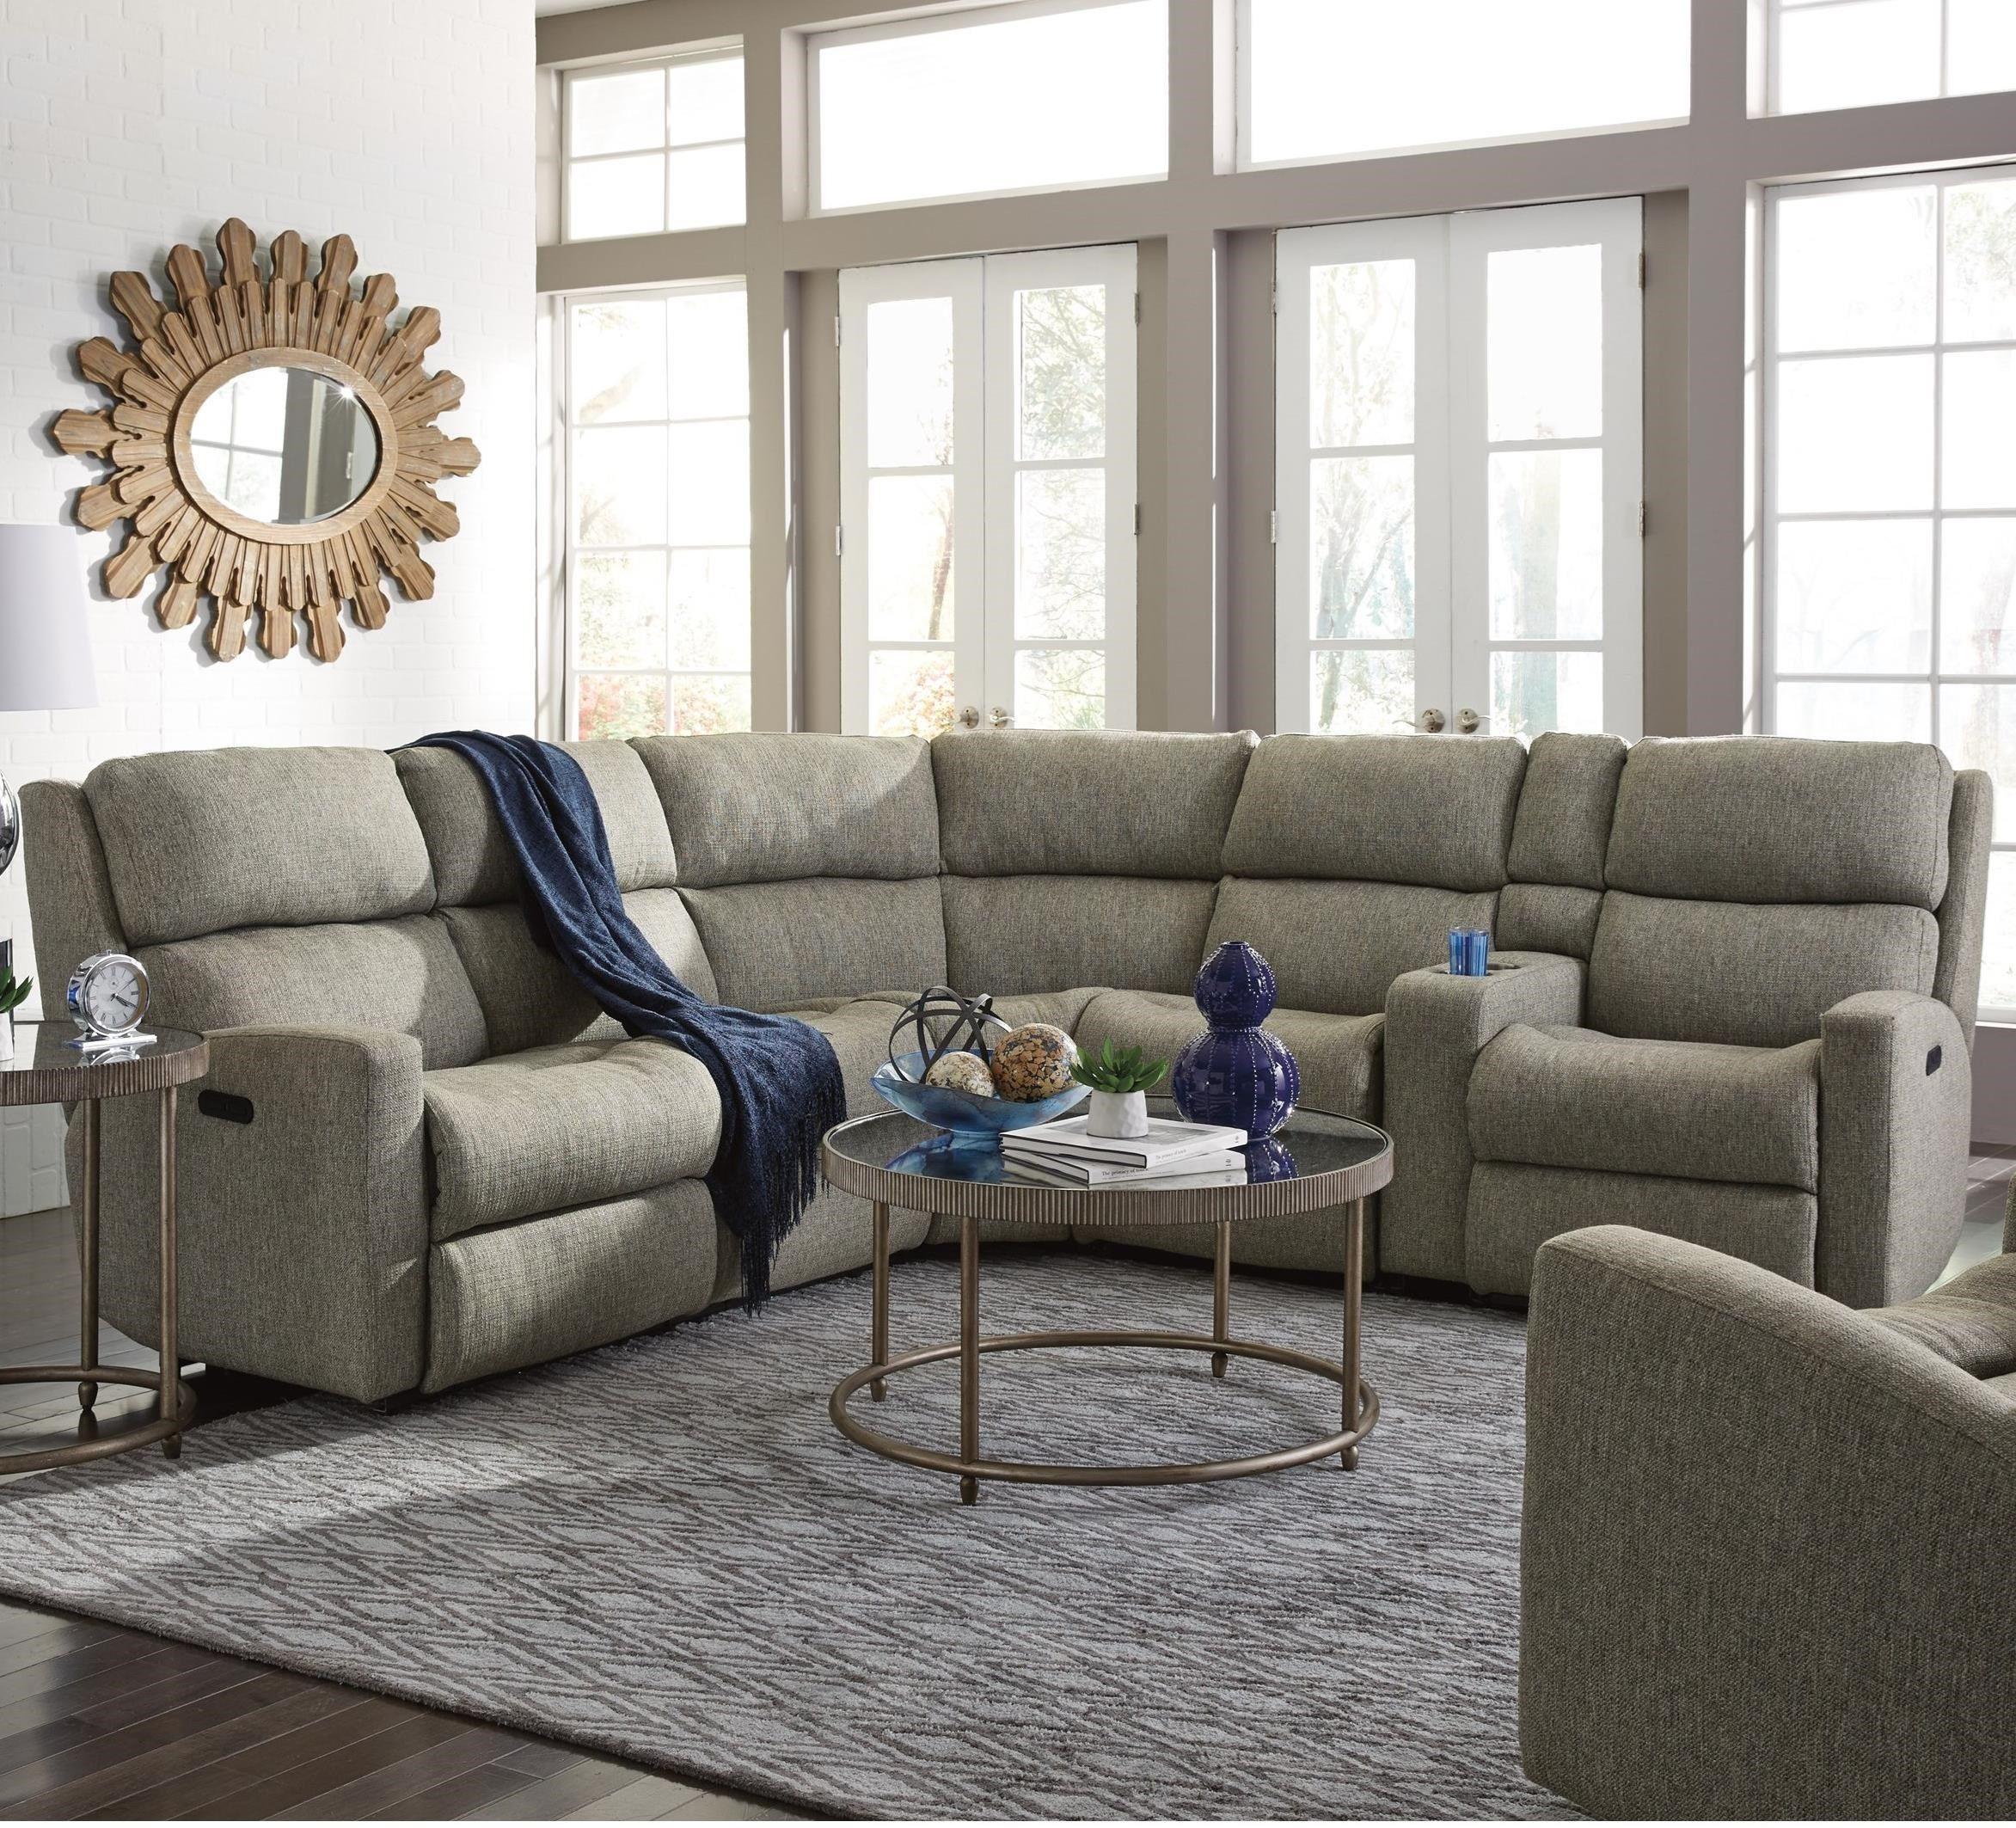 Groovy Catalina Six Piece Power Reclining Sectional Sofa By Inzonedesignstudio Interior Chair Design Inzonedesignstudiocom